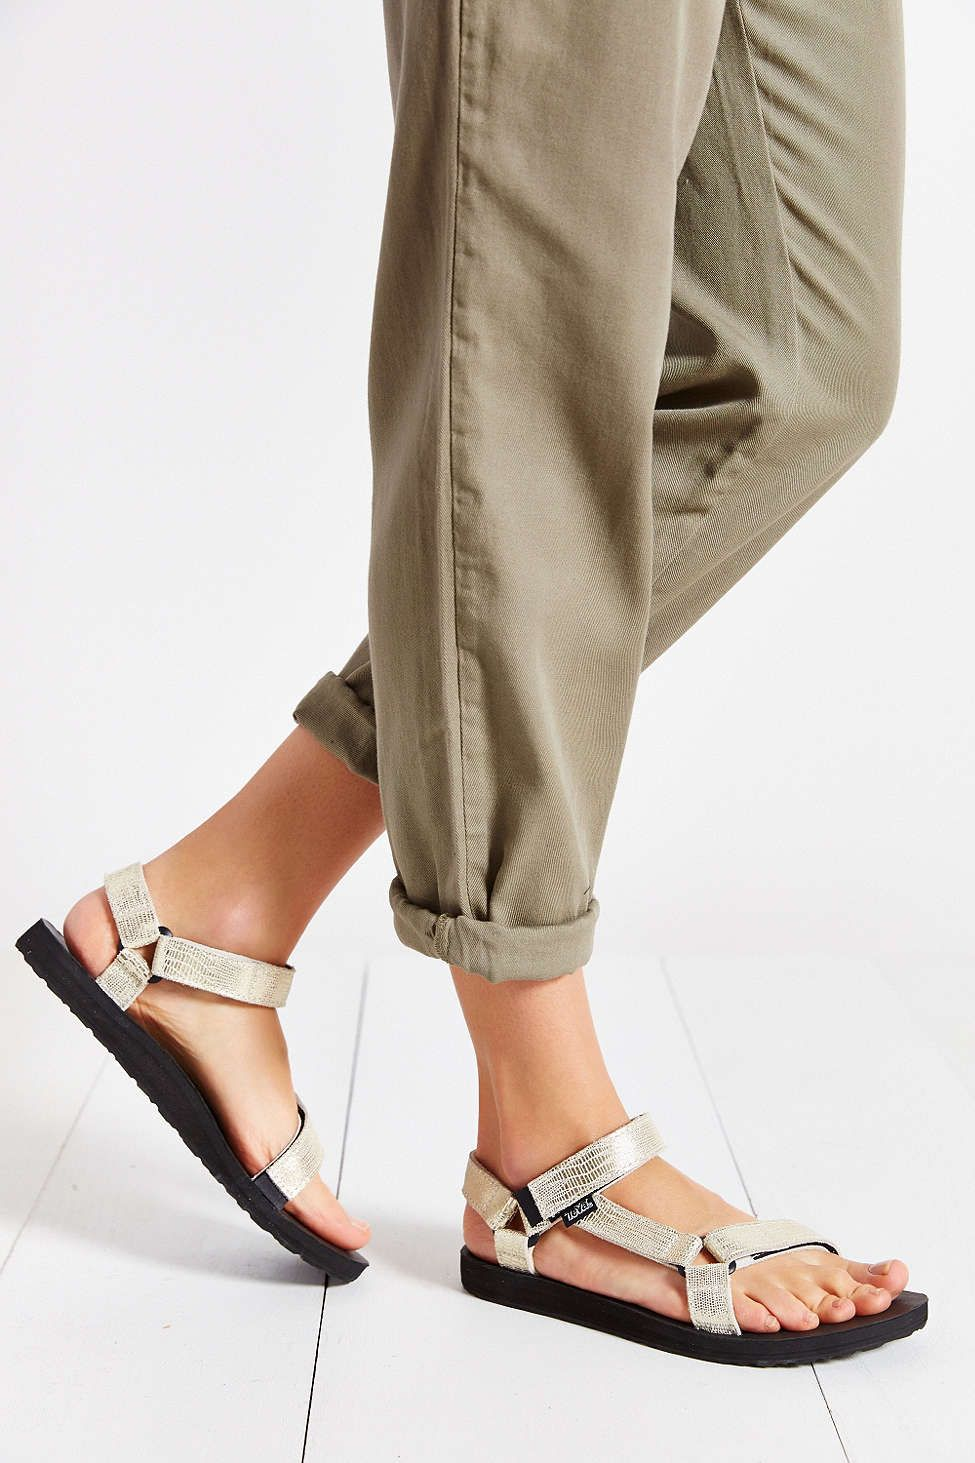 Teva Original Leather Metallic Sandal Urban Outfitters